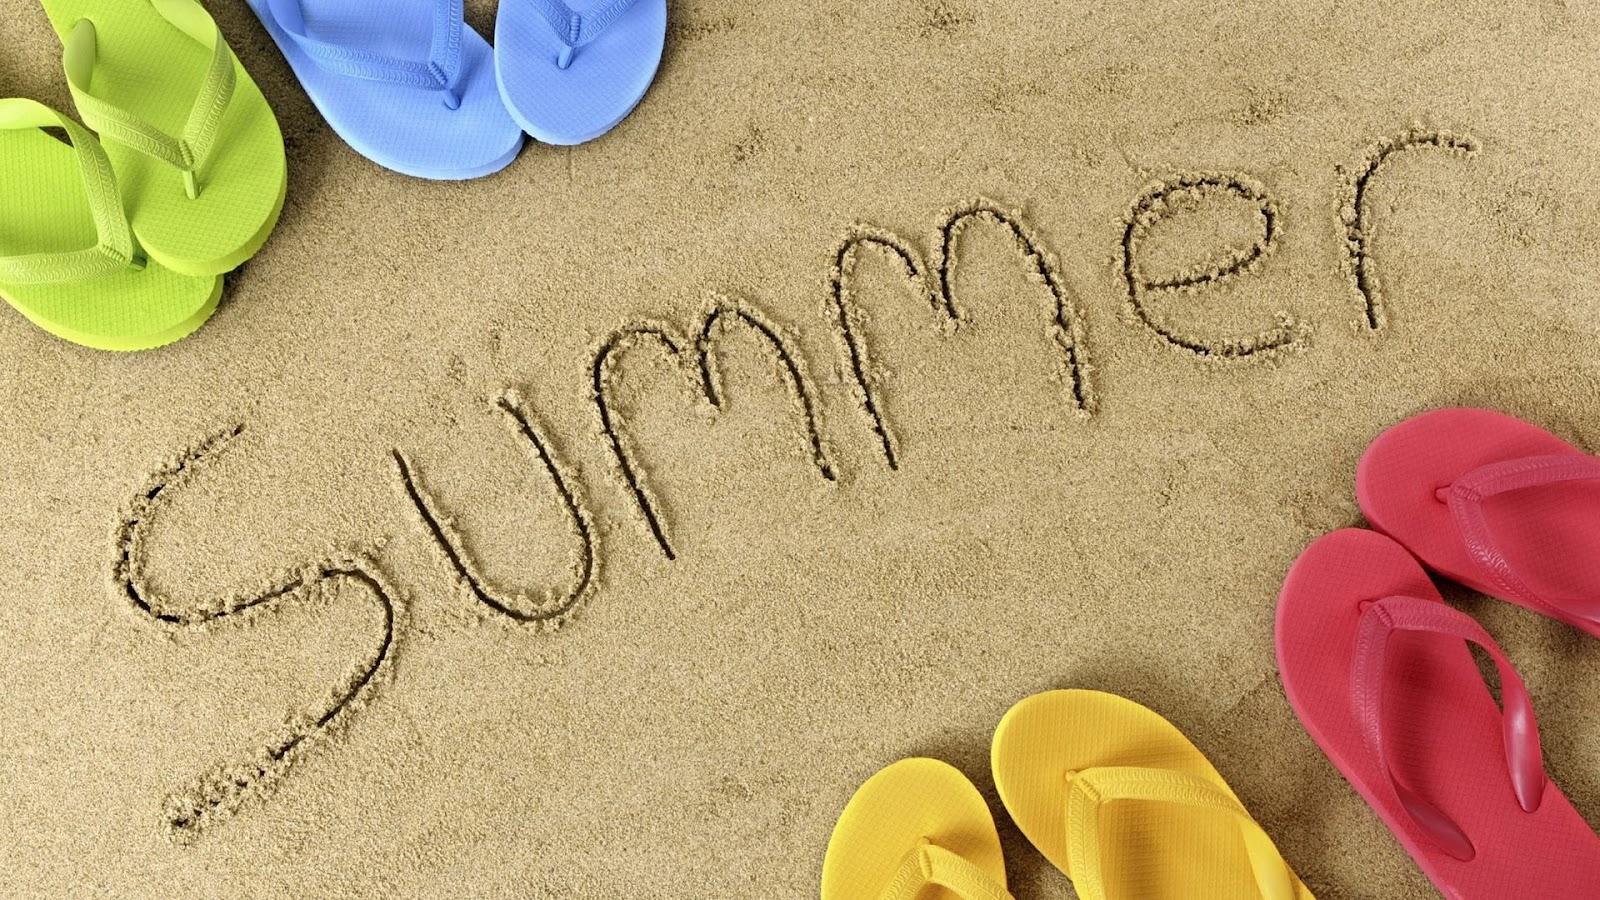 http://3.bp.blogspot.com/-vTymaZcBlIY/T7p2Hrsd38I/AAAAAAAADmk/_O4tclaO1YU/s1600/Summer+Breeze+7.jpg